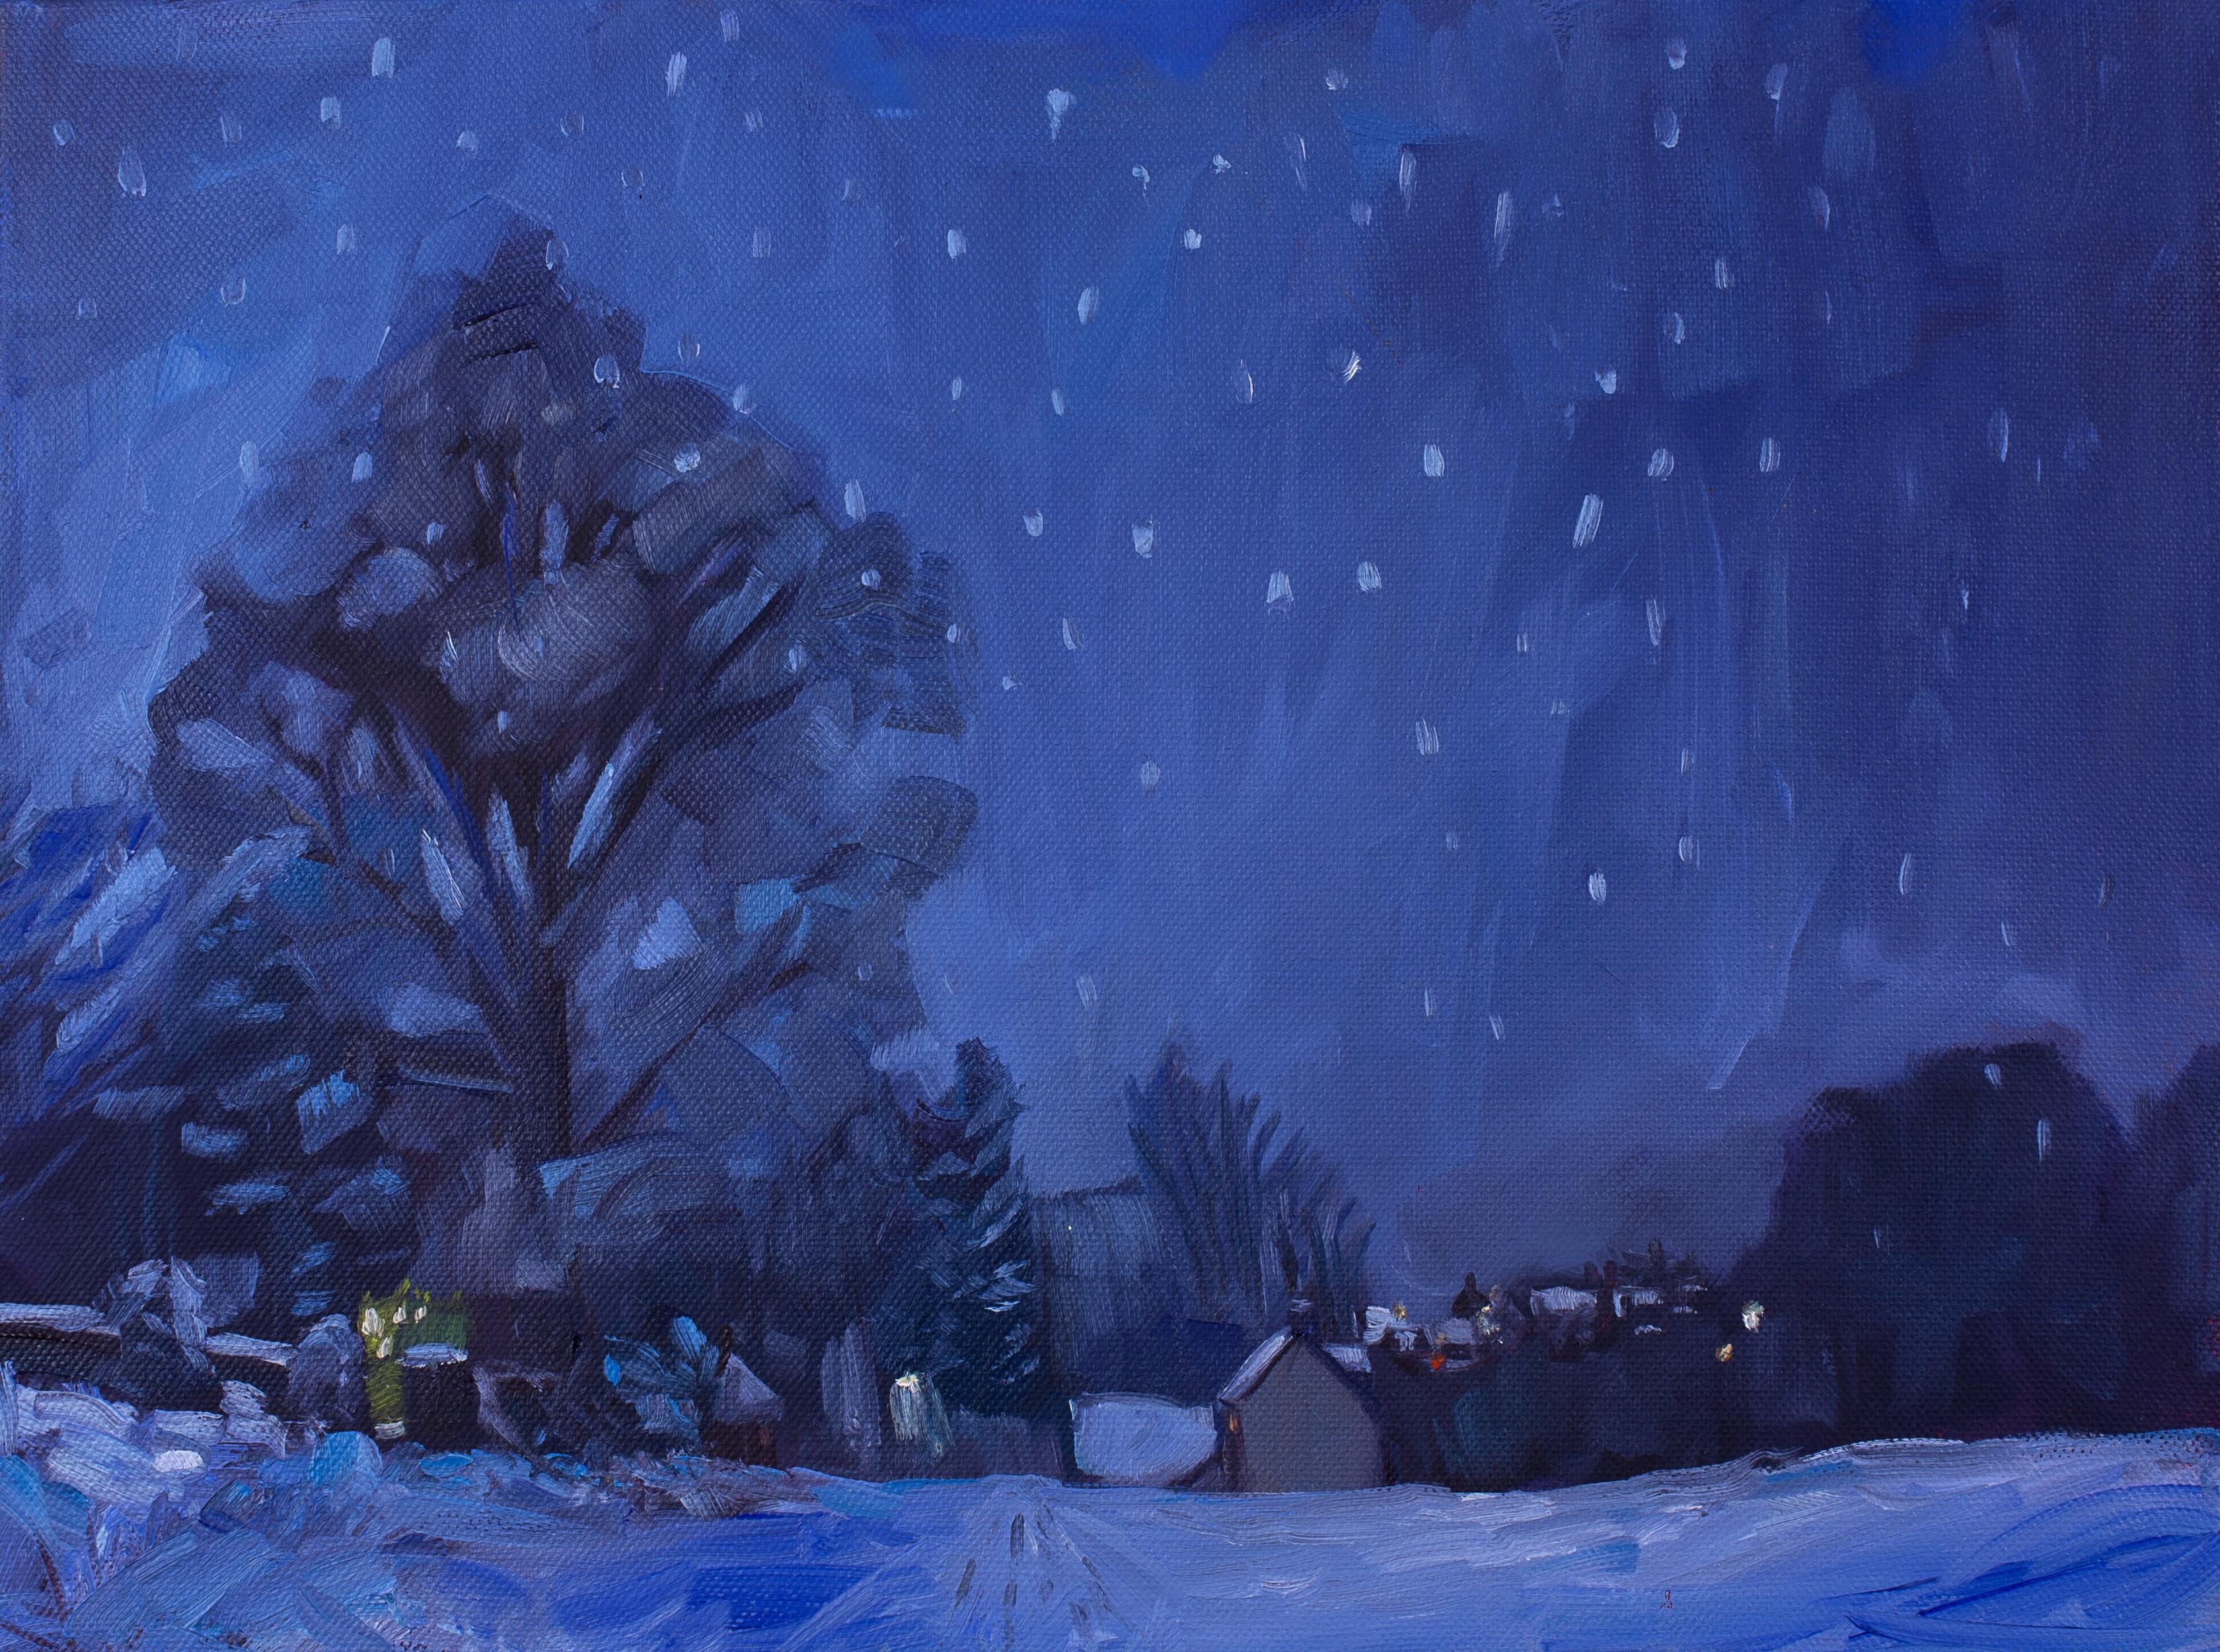 Snow on Ditchfield